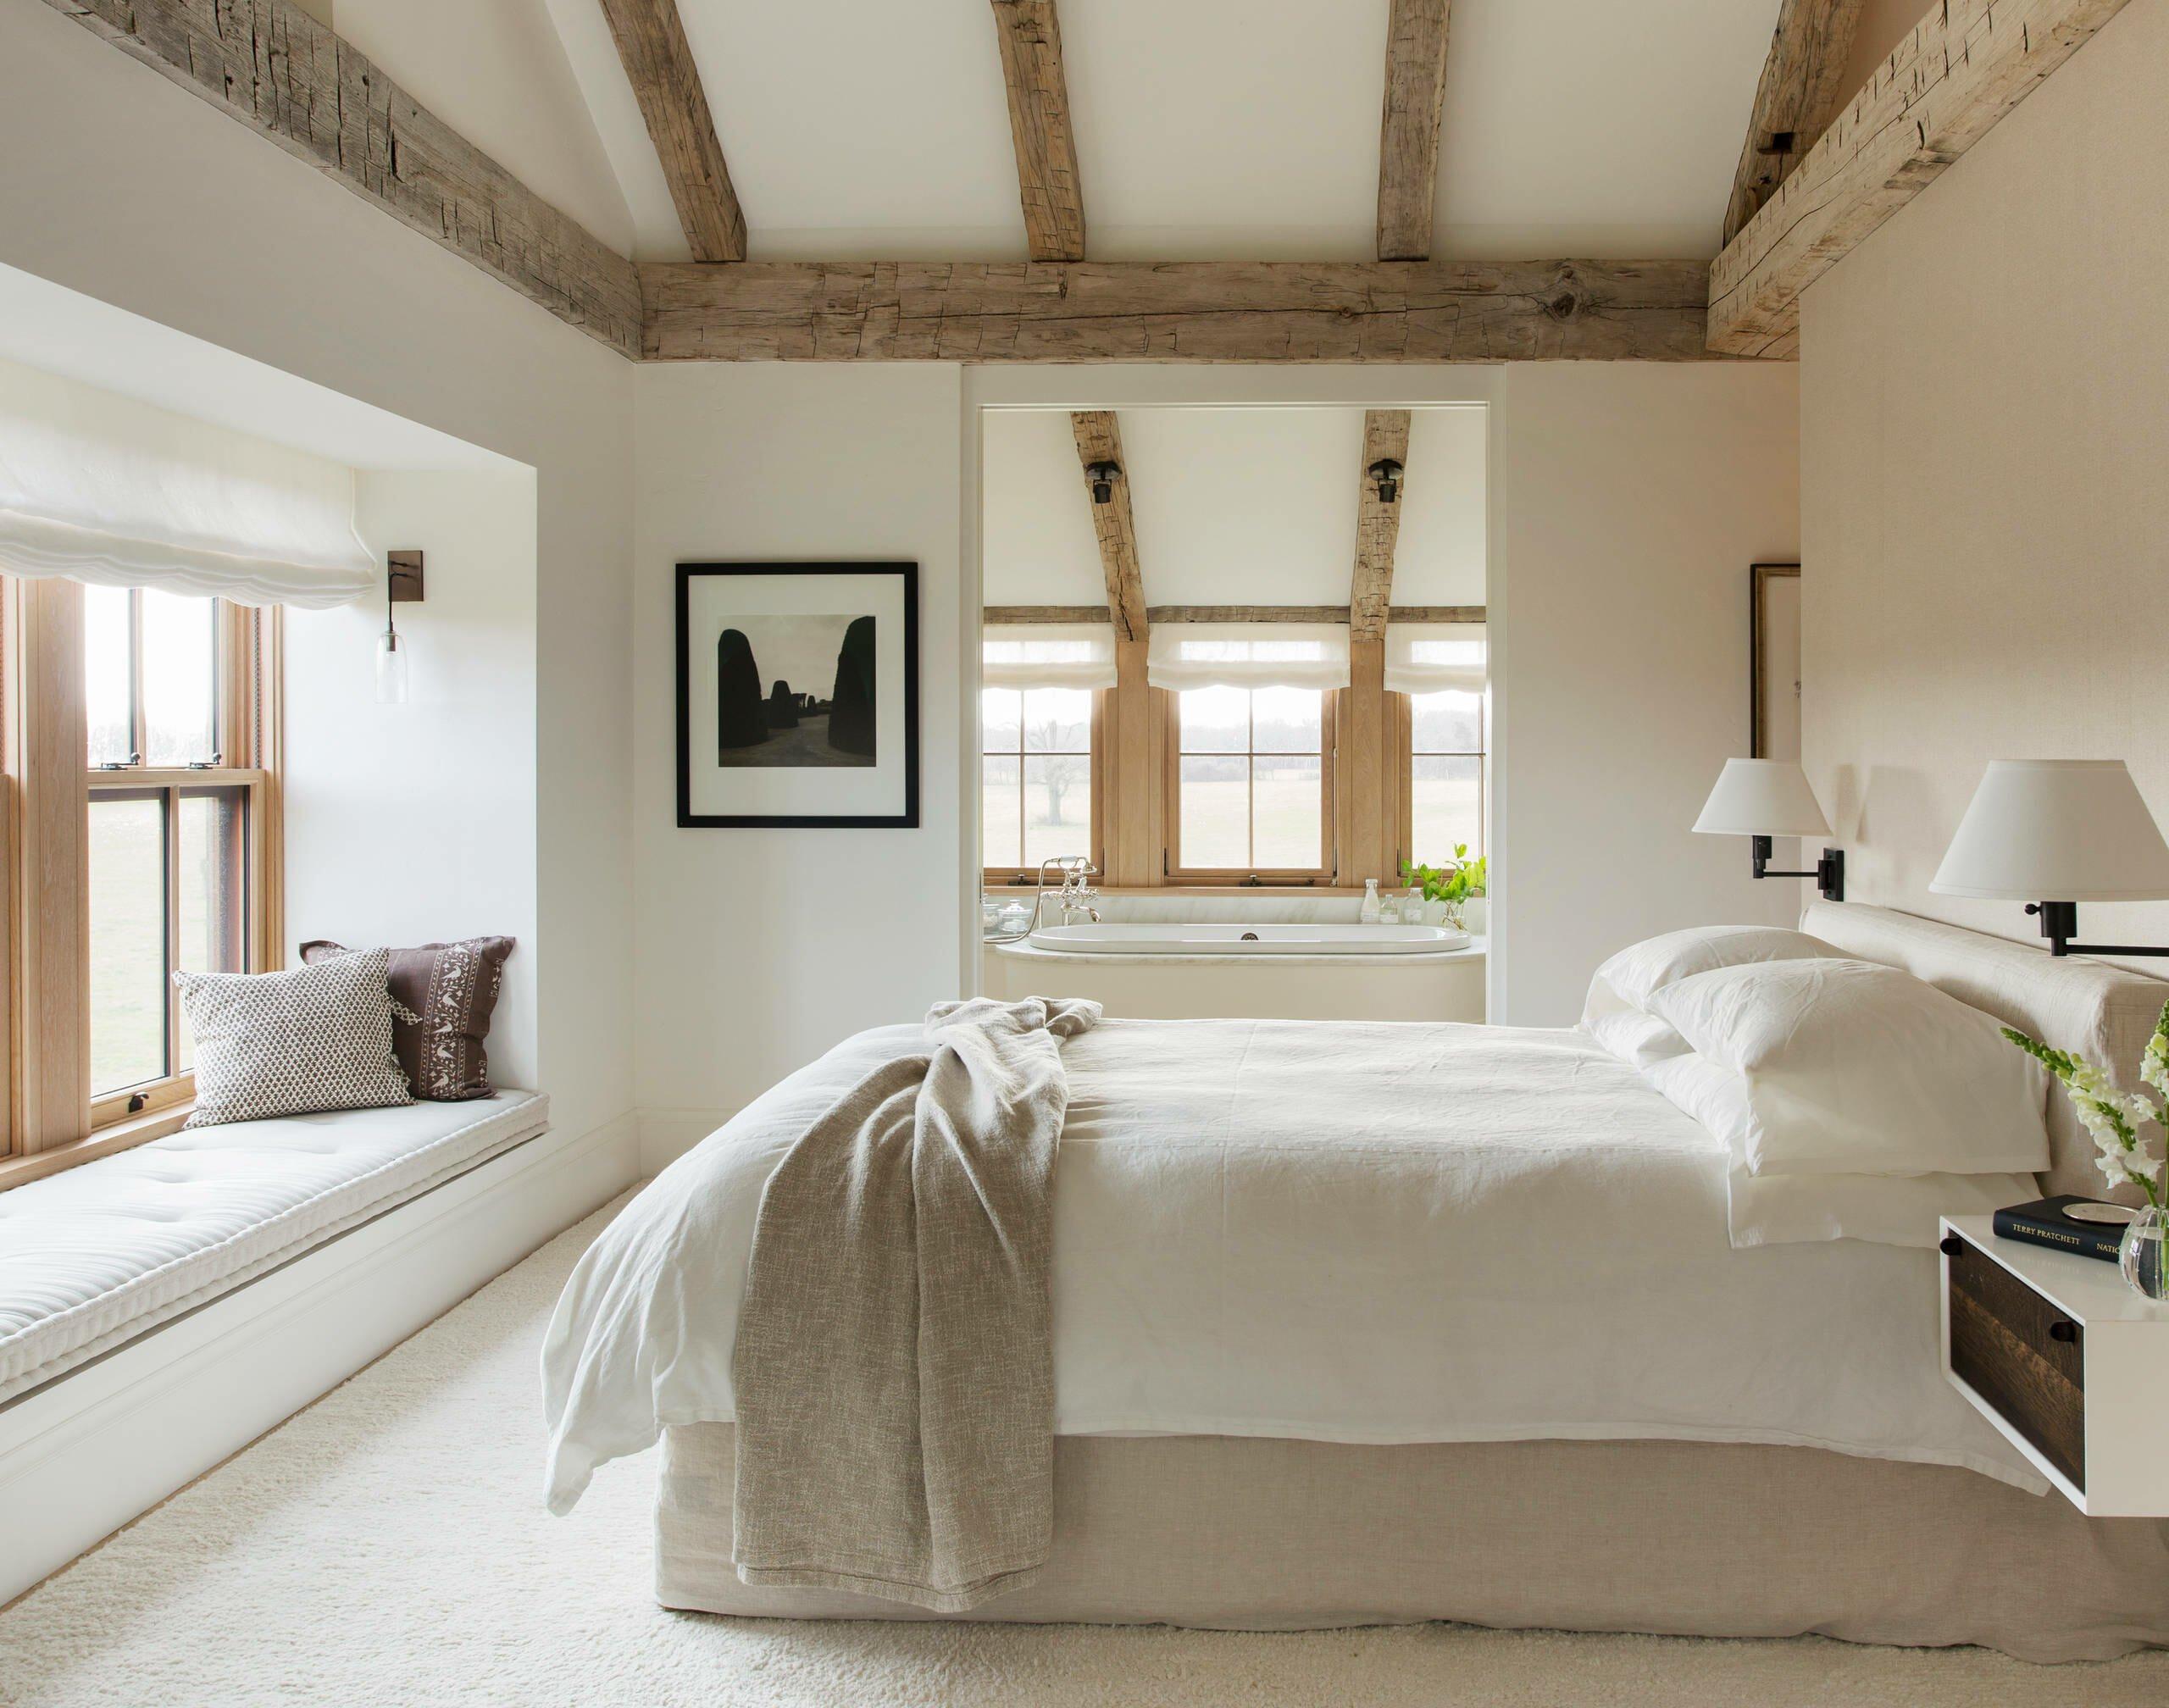 Simple bedroom design in modern farmhouse decor